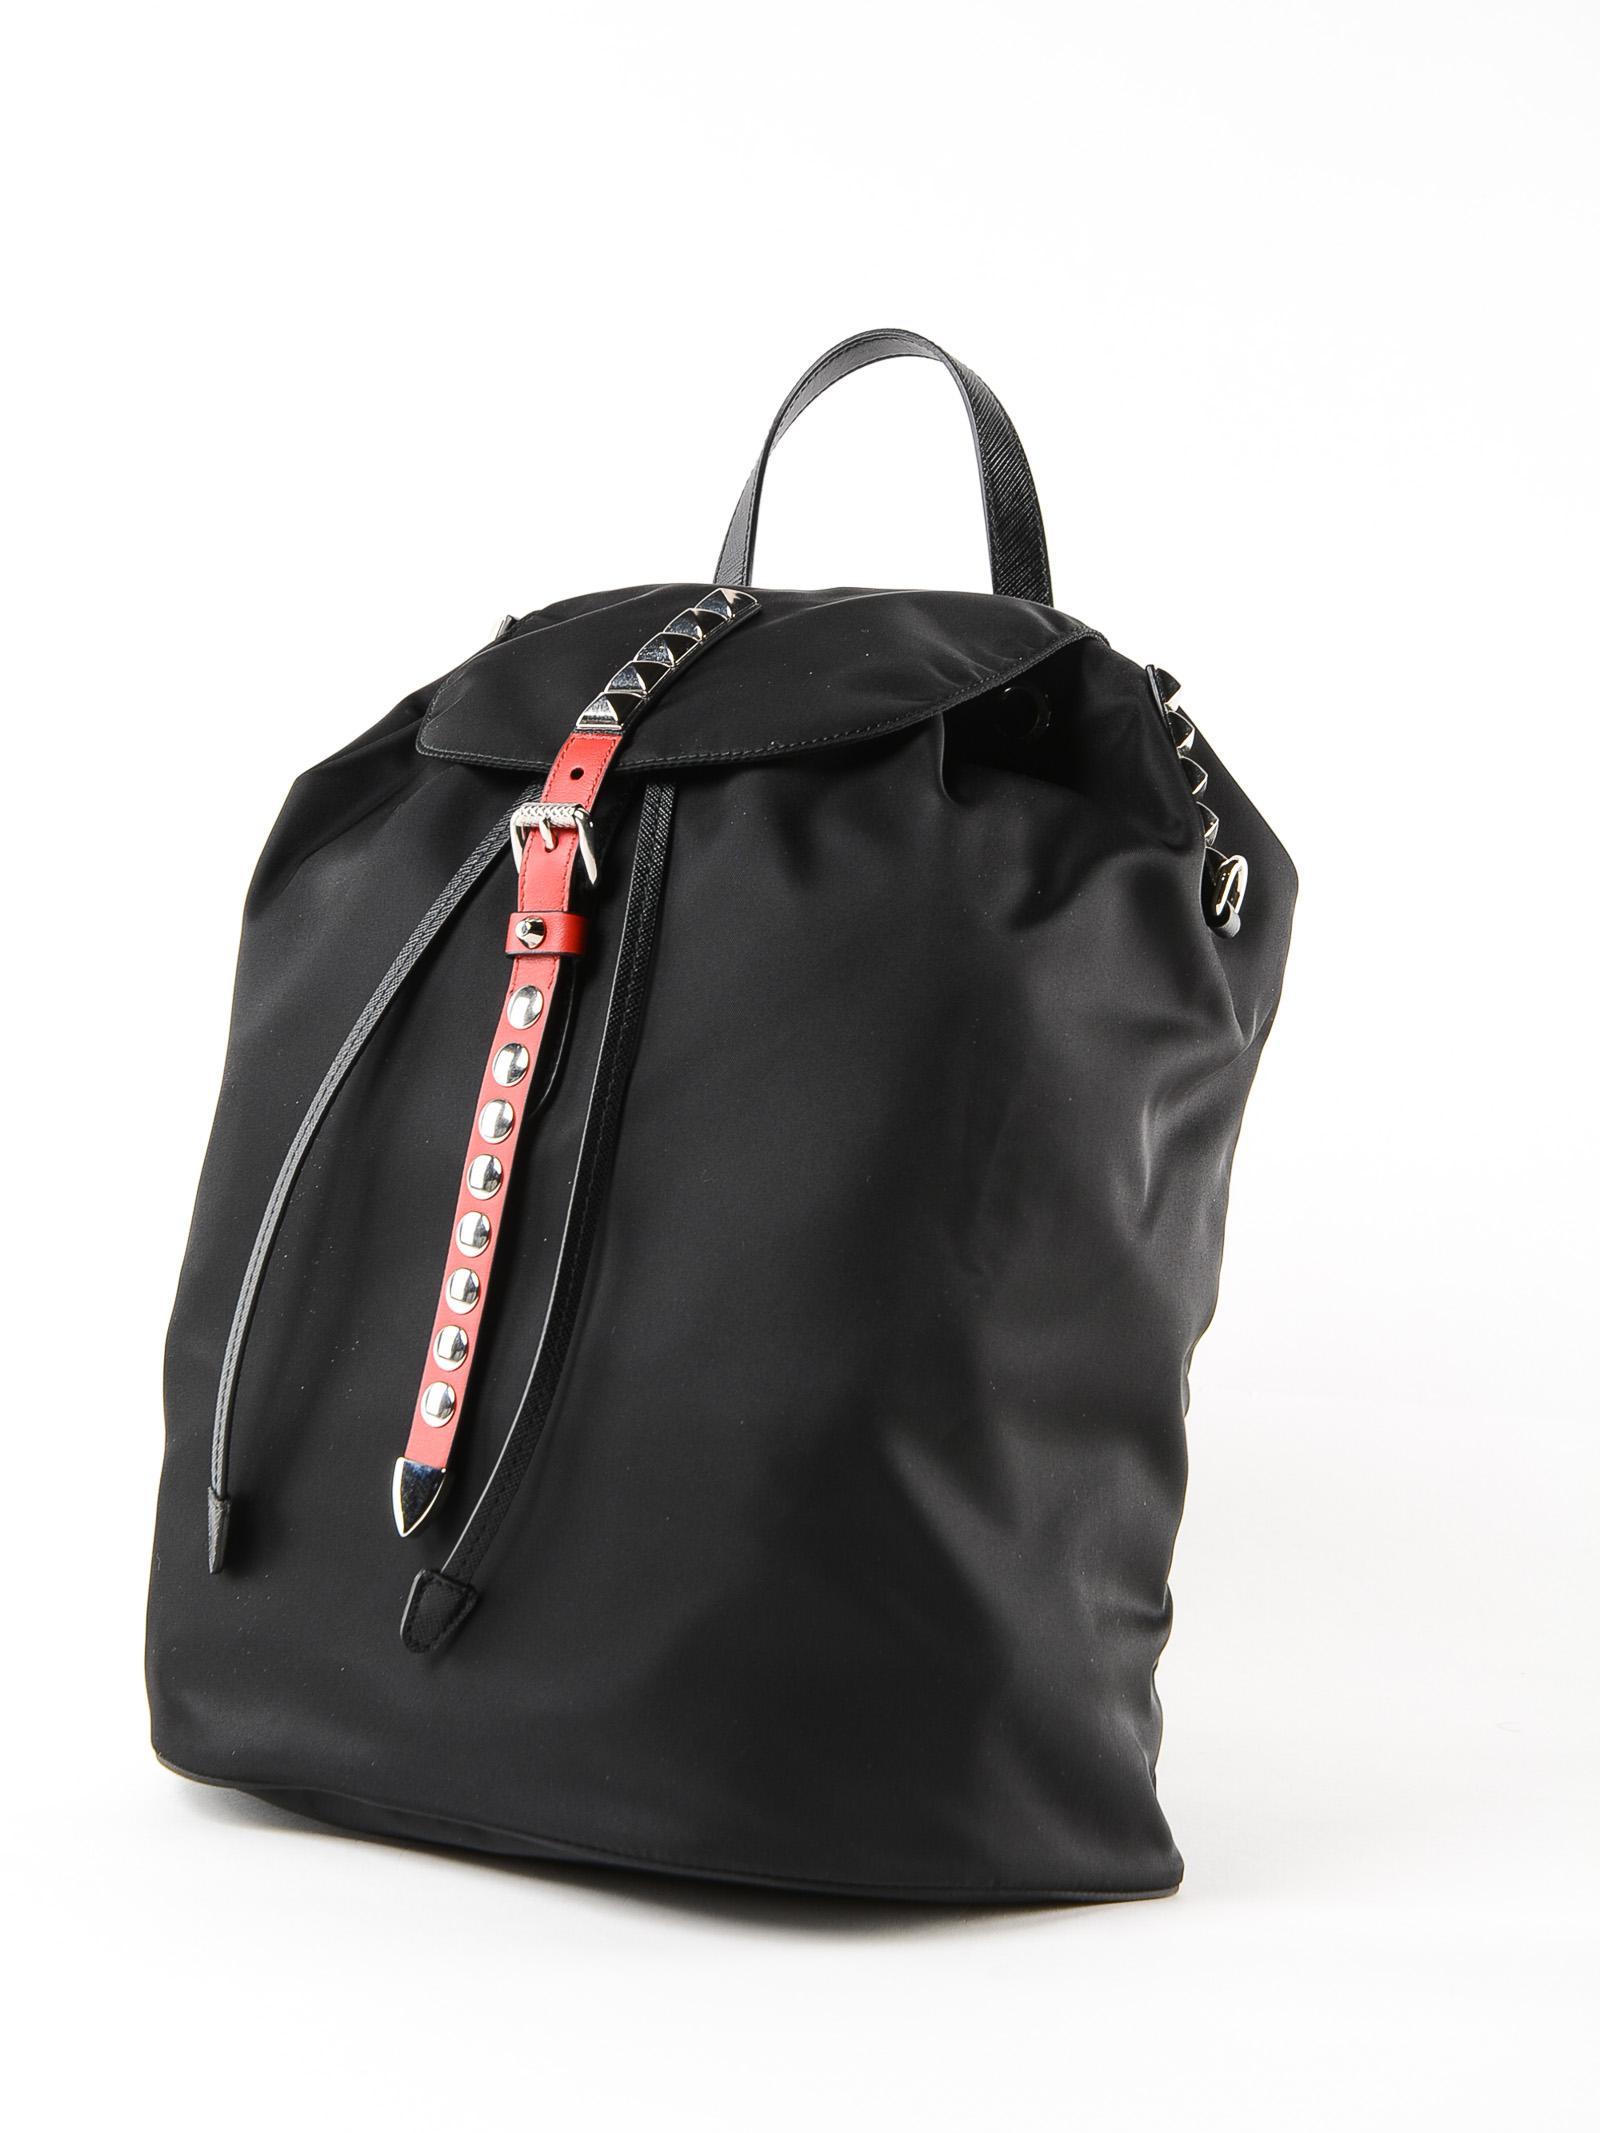 ccb99a72dfe3 Prada Black Backpack in Black - Lyst